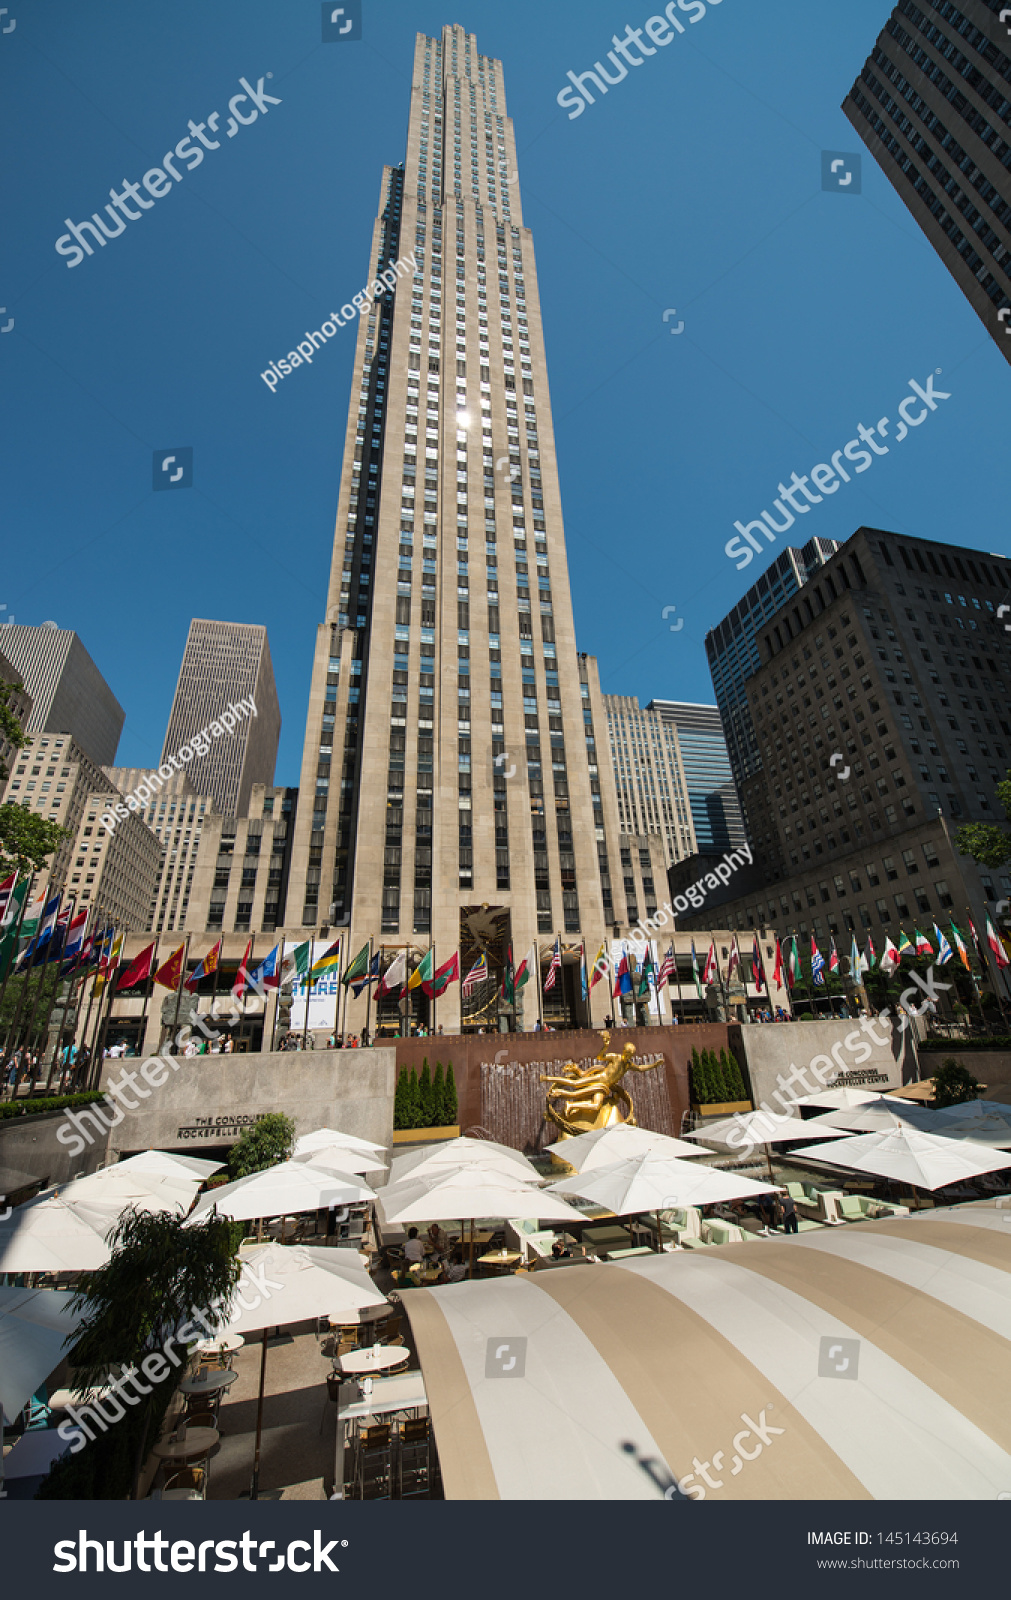 New York City Jun 15 Rockefeller Stock Photo 145143694